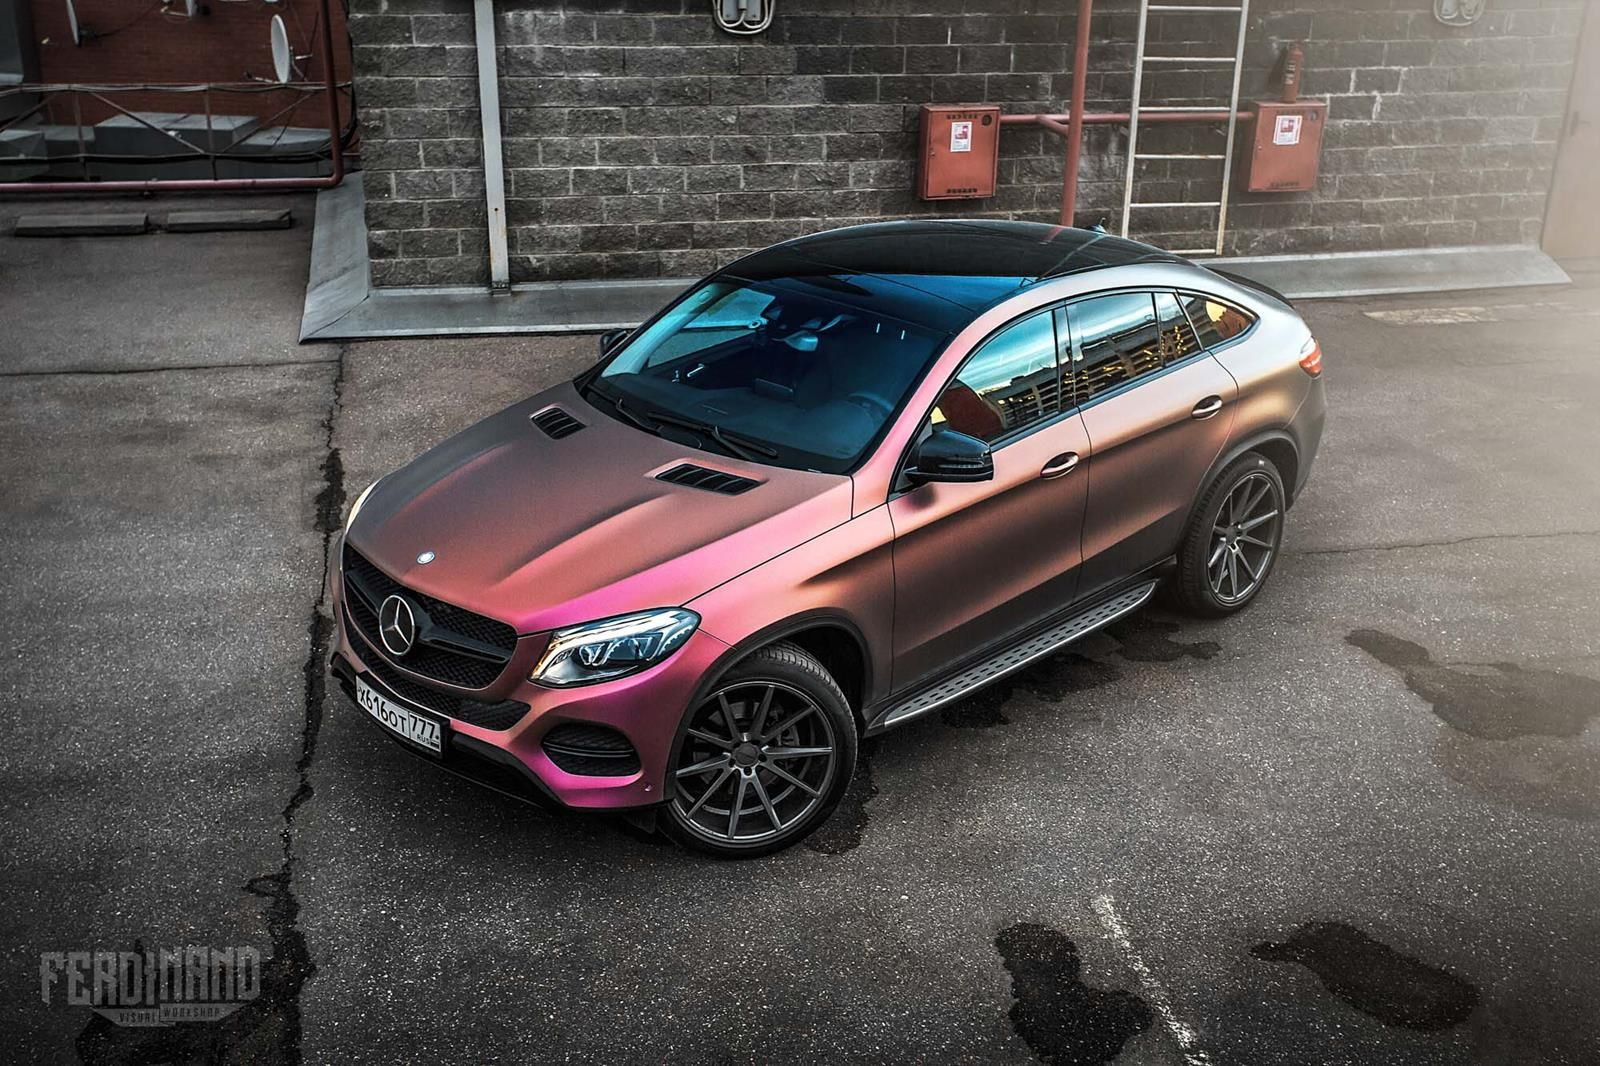 MercedesBenz GLE Coupe Receives a Unique Wrap